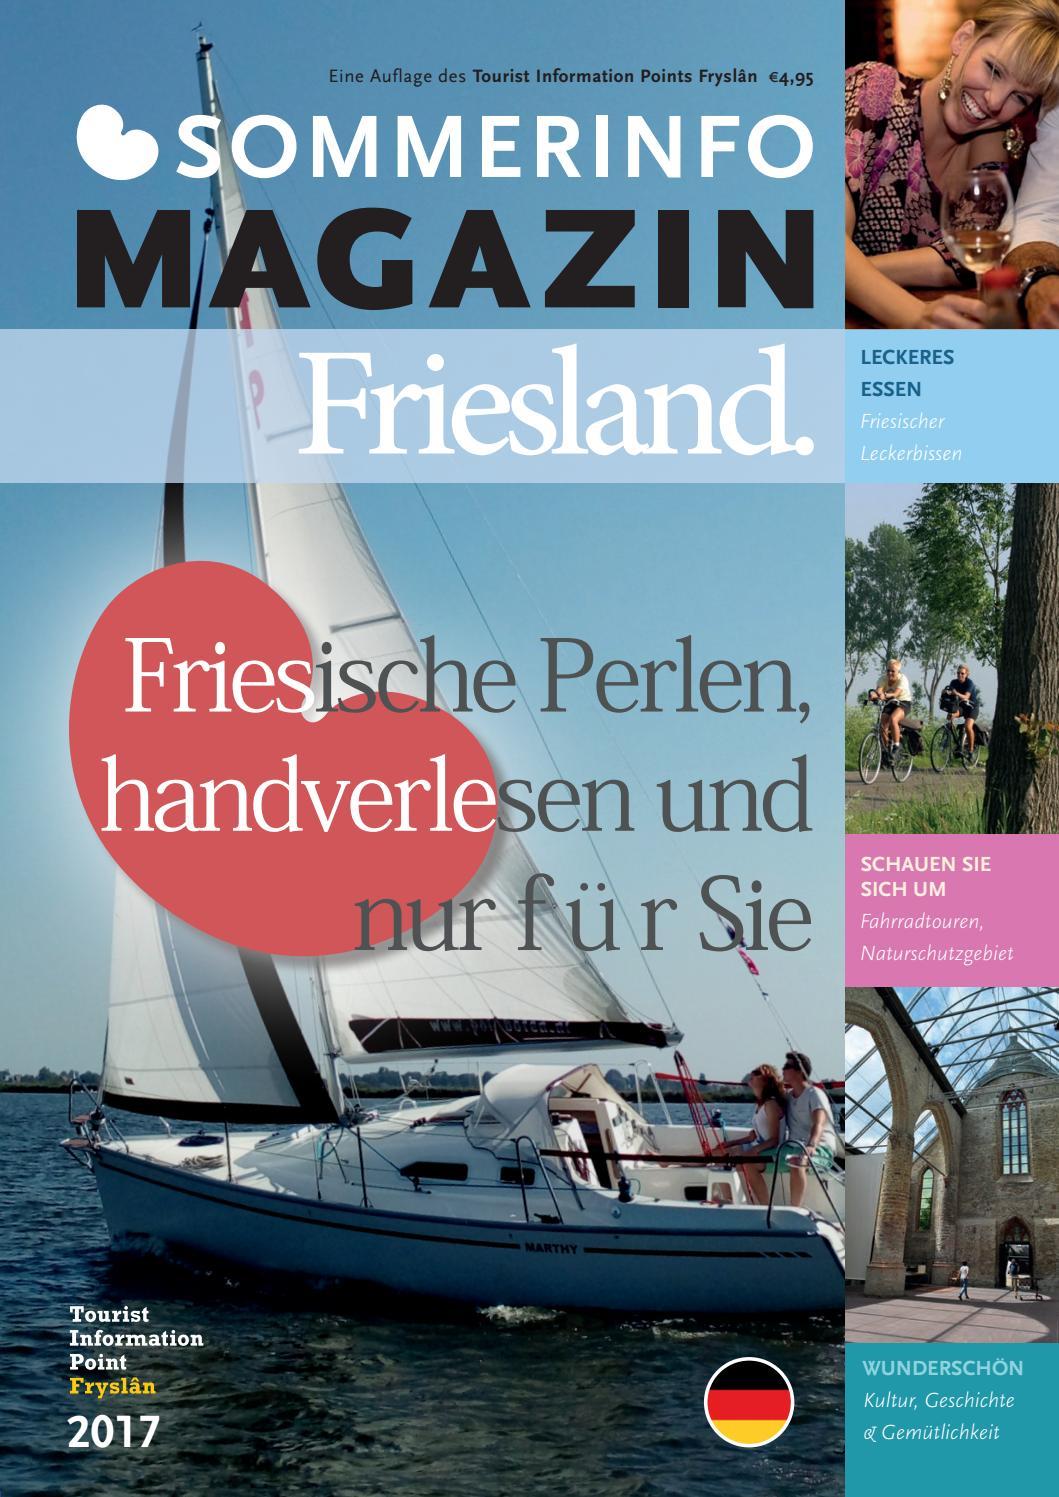 Sommerinfo magazine friesland duits 2017 by Tourist Information ...